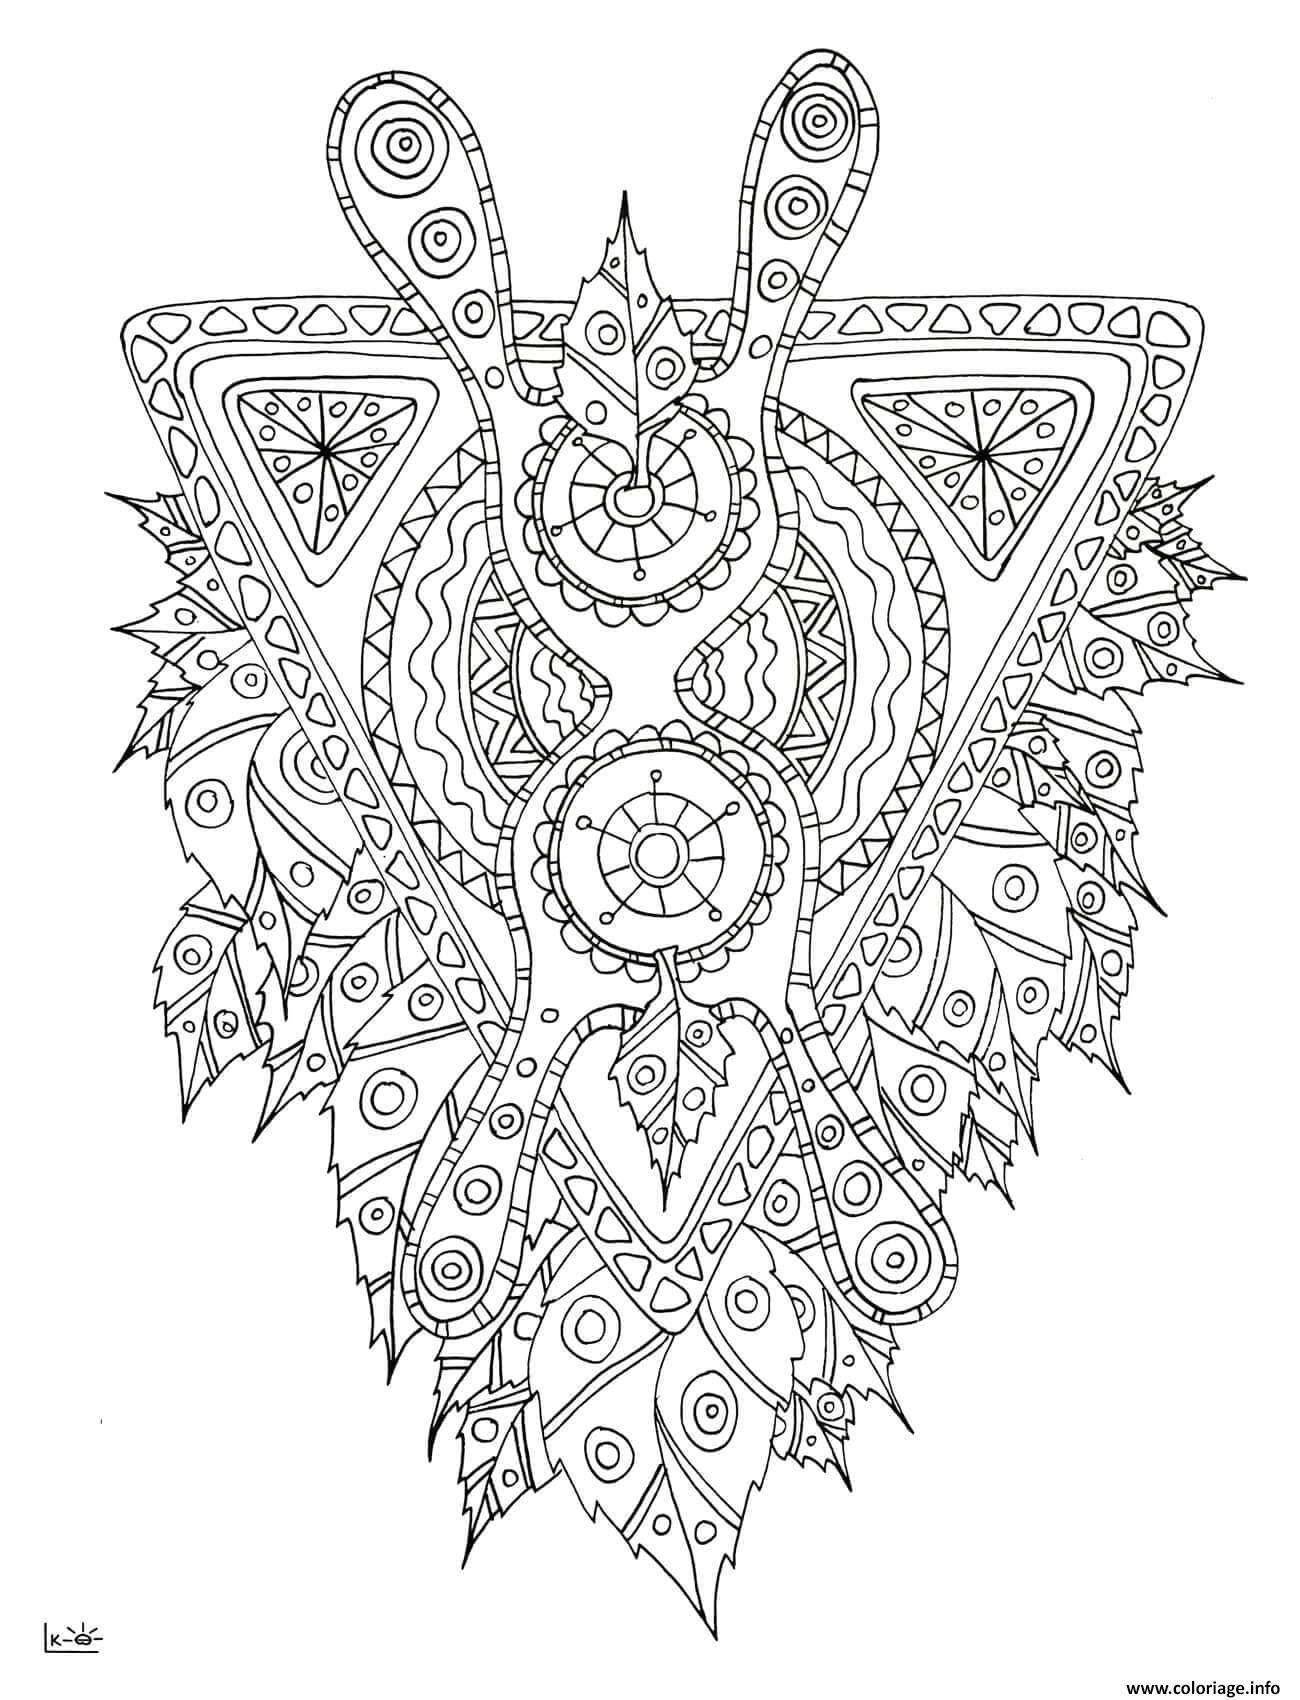 Dessin mythical creature with tribal pattern adulte Coloriage Gratuit à Imprimer